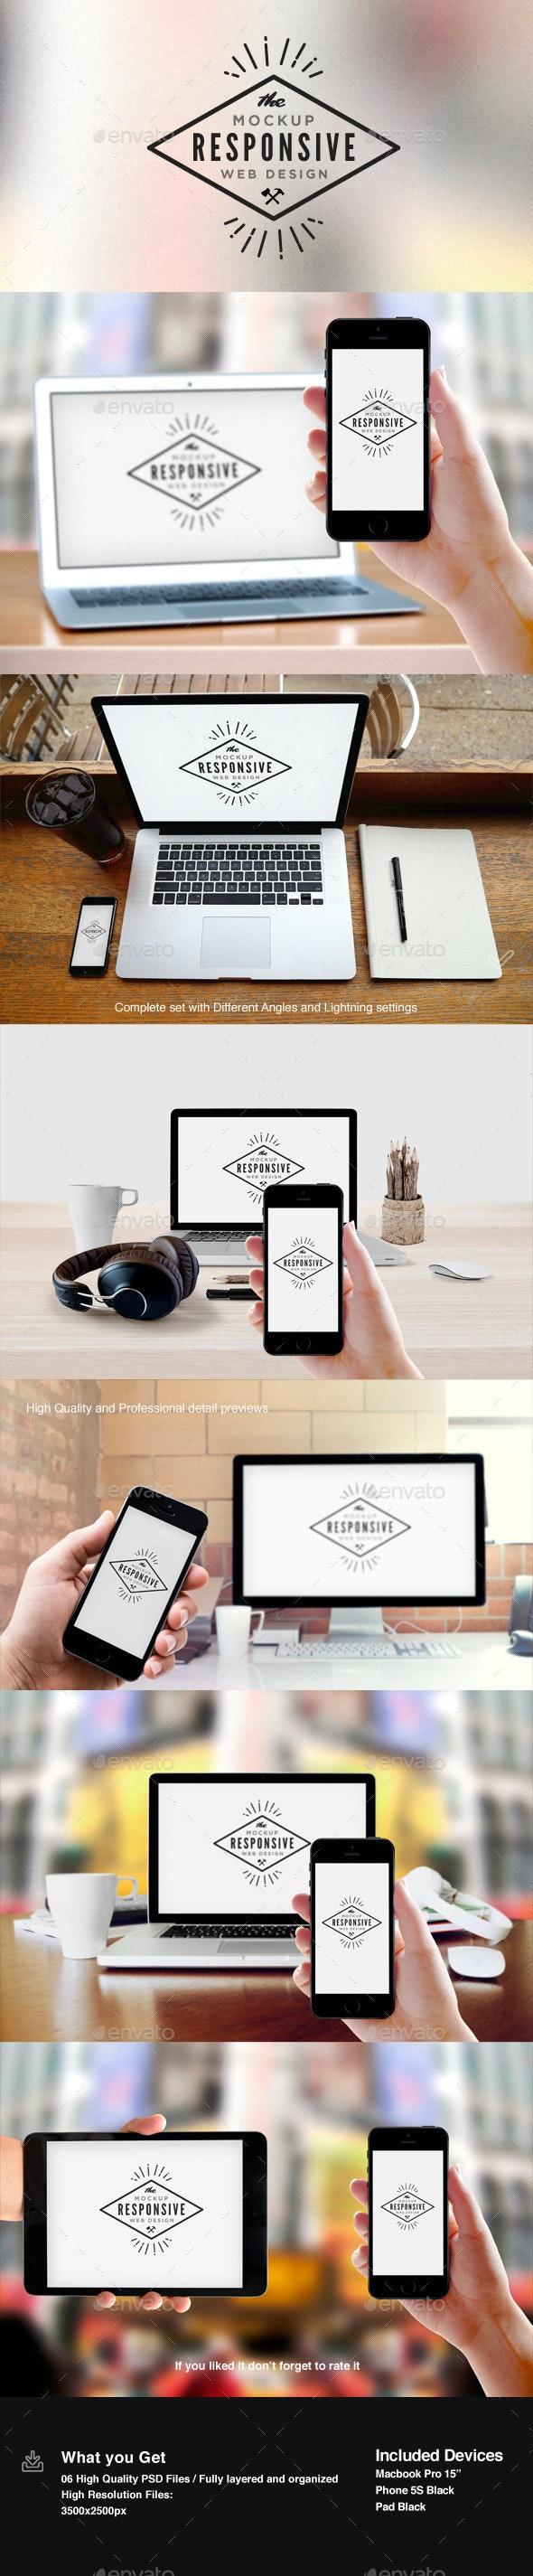 Responsive Design Screen Mock-Up - Multiple Displays